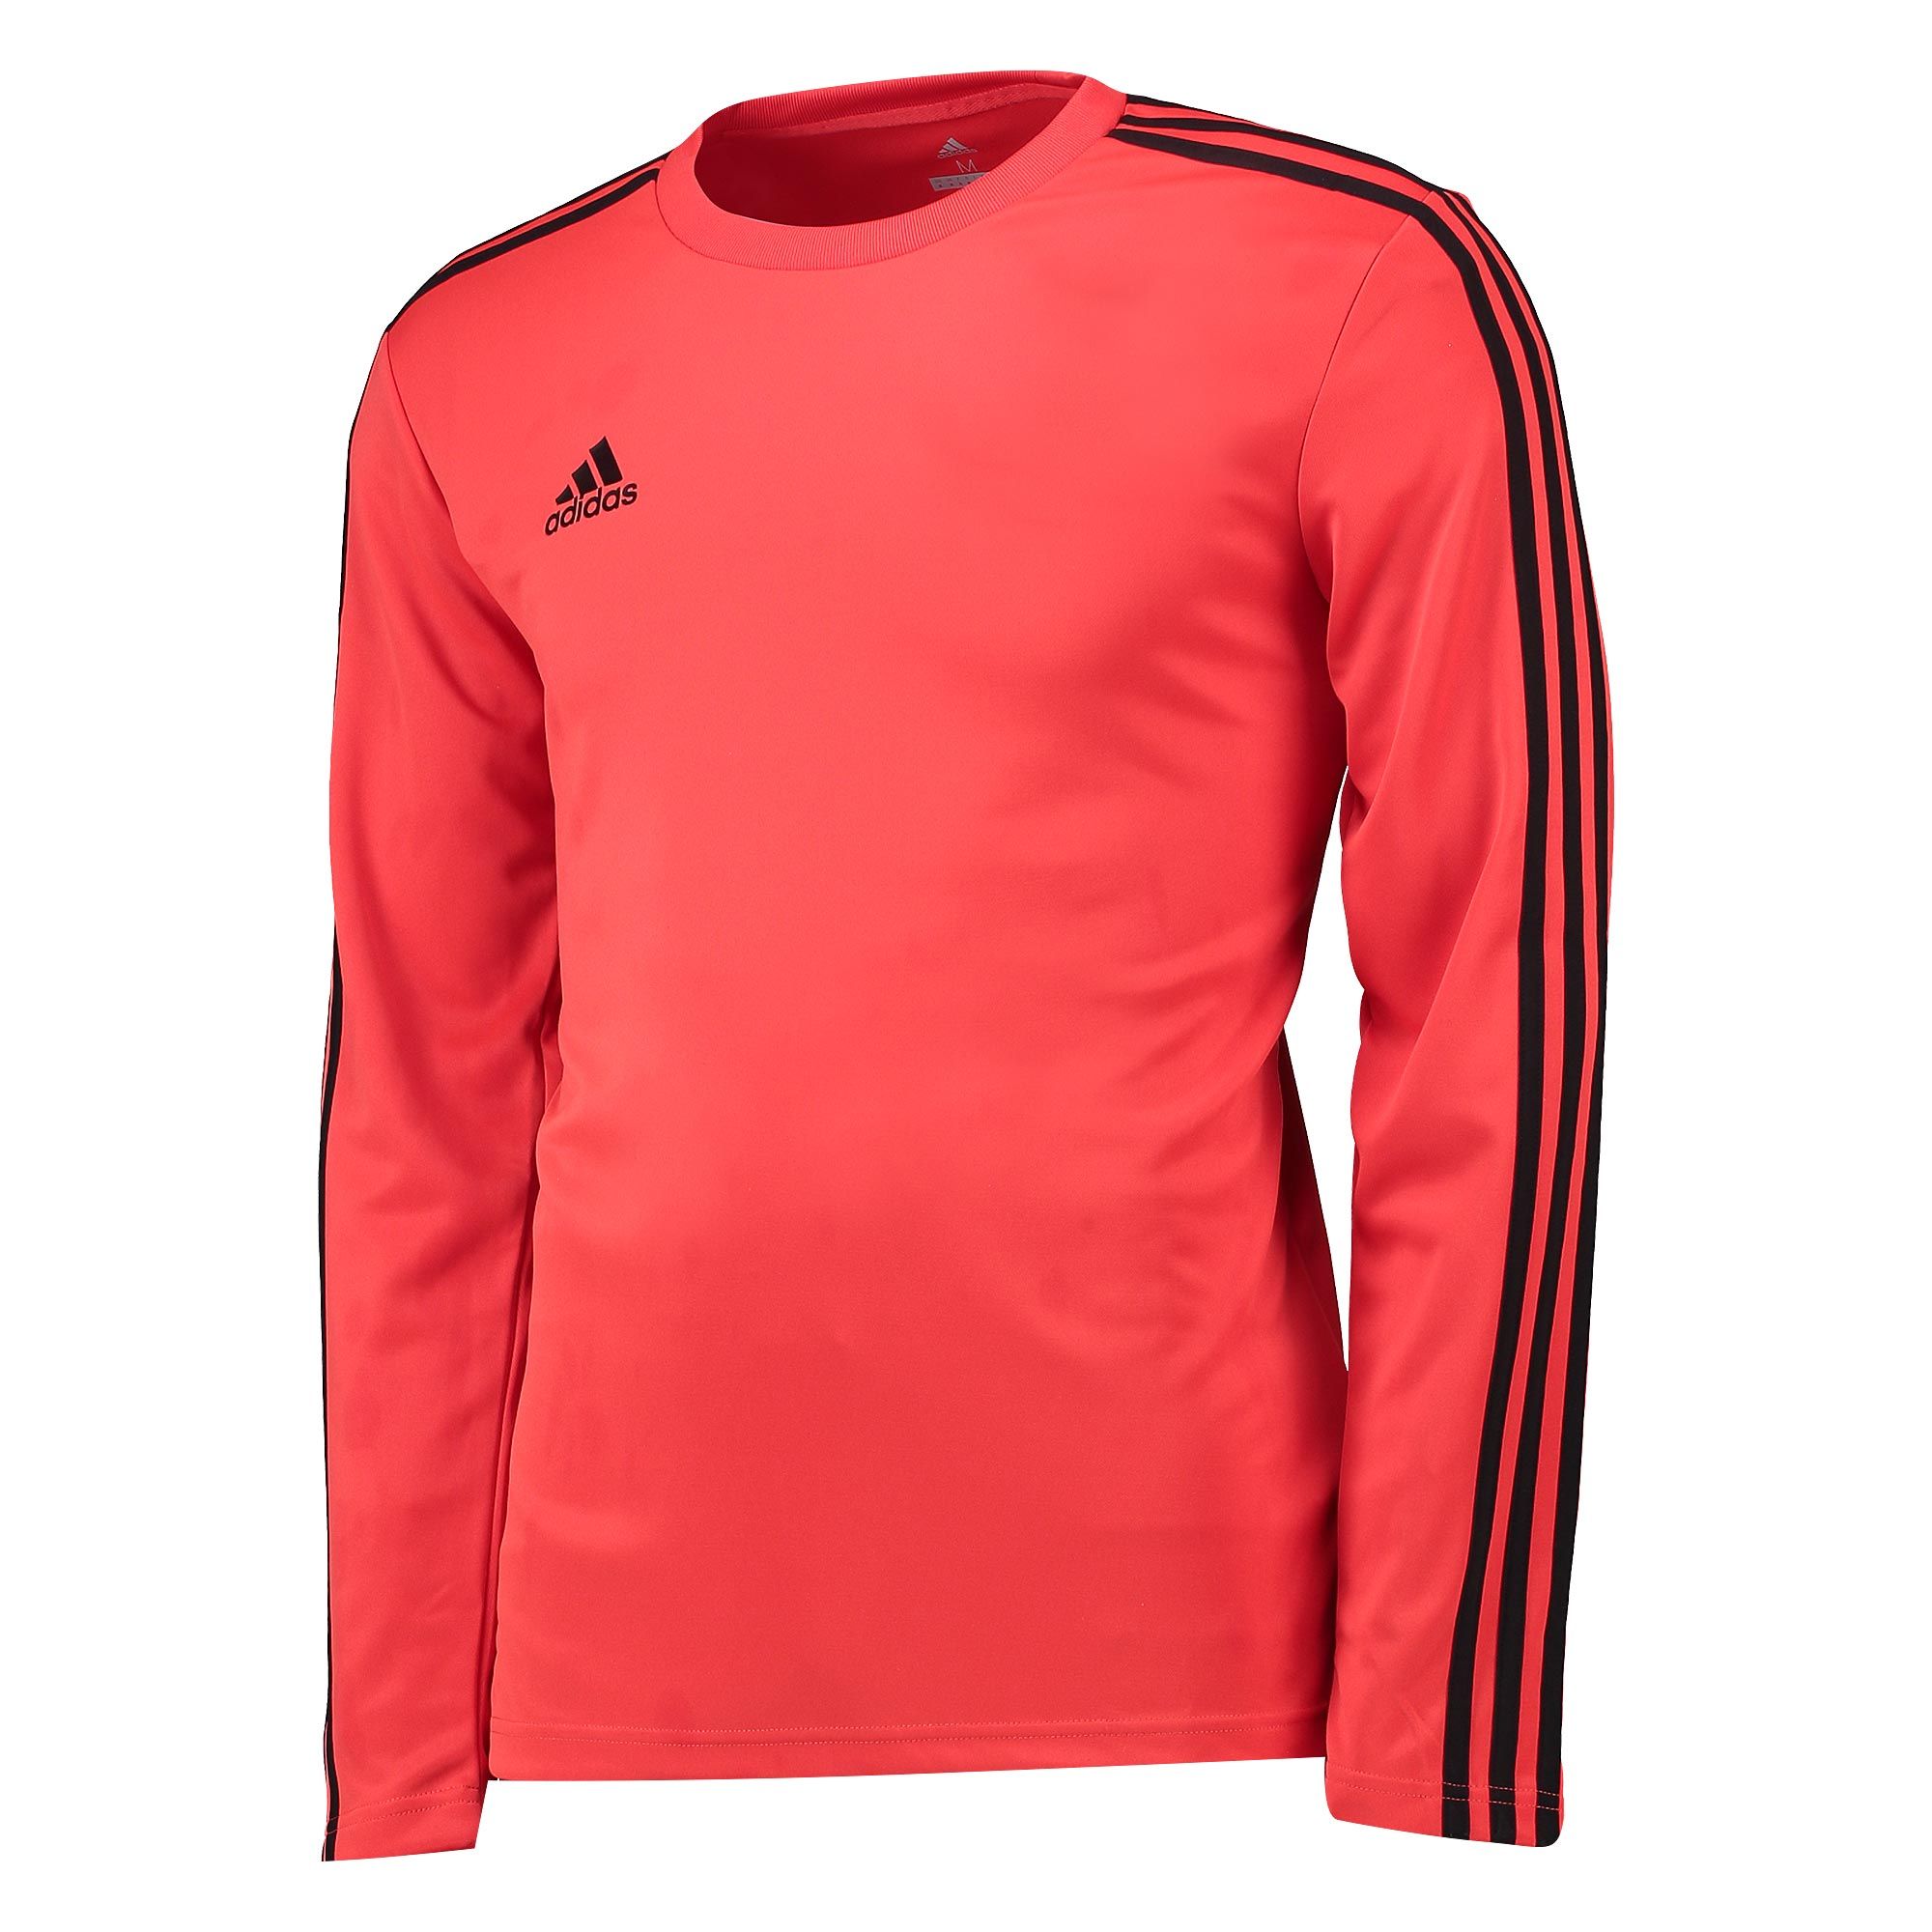 Adidas / Adidas Tango Training Long-Sleeved Top - Red